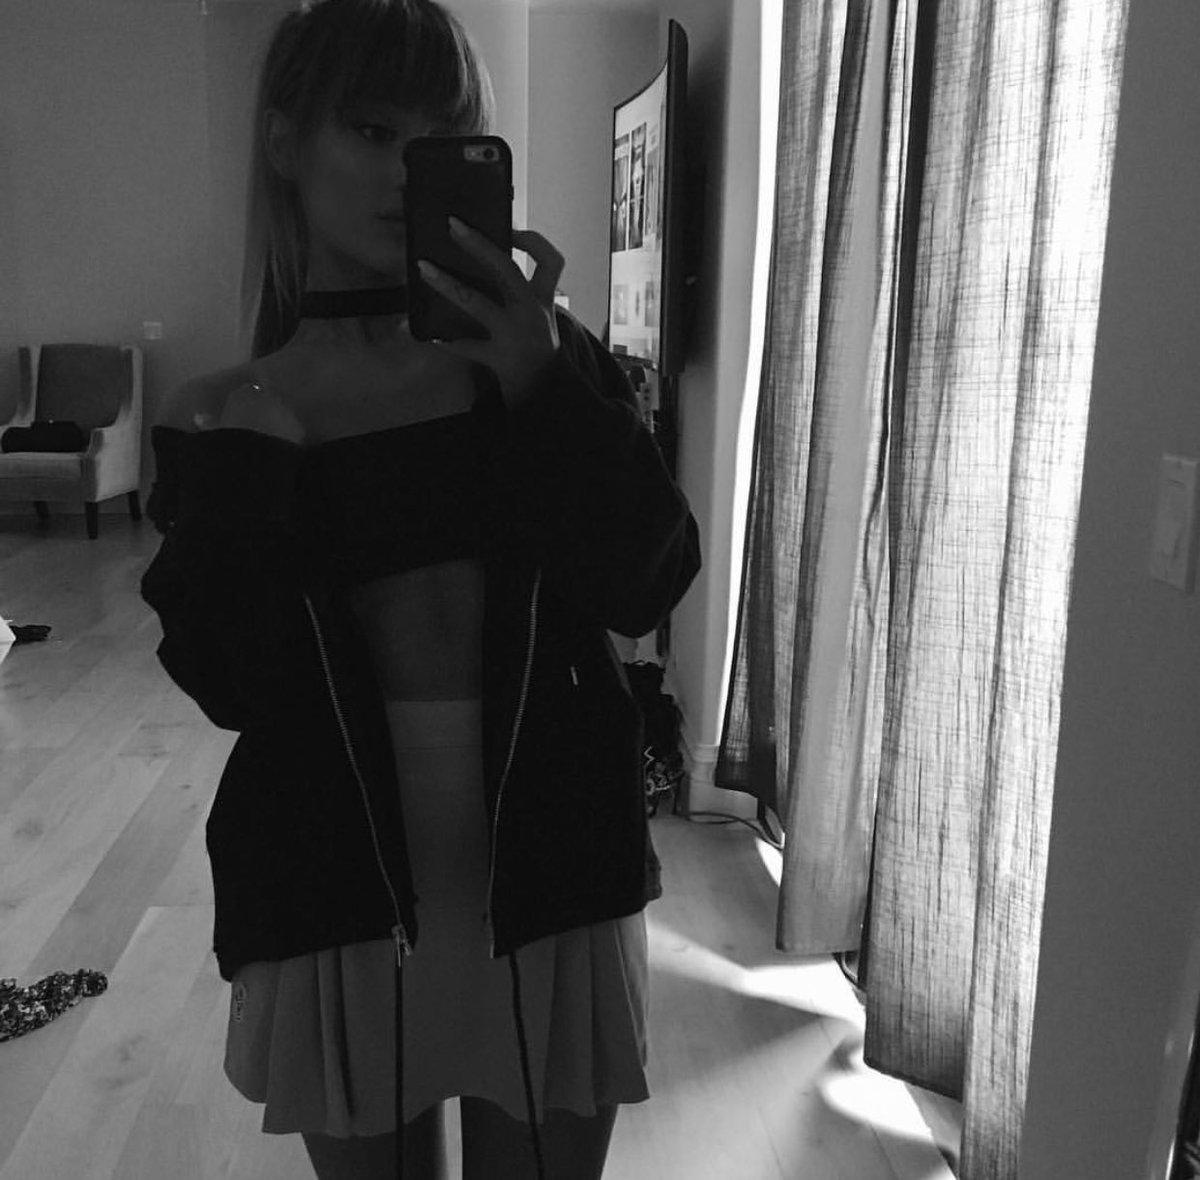 【instagramより】 #アリアナ